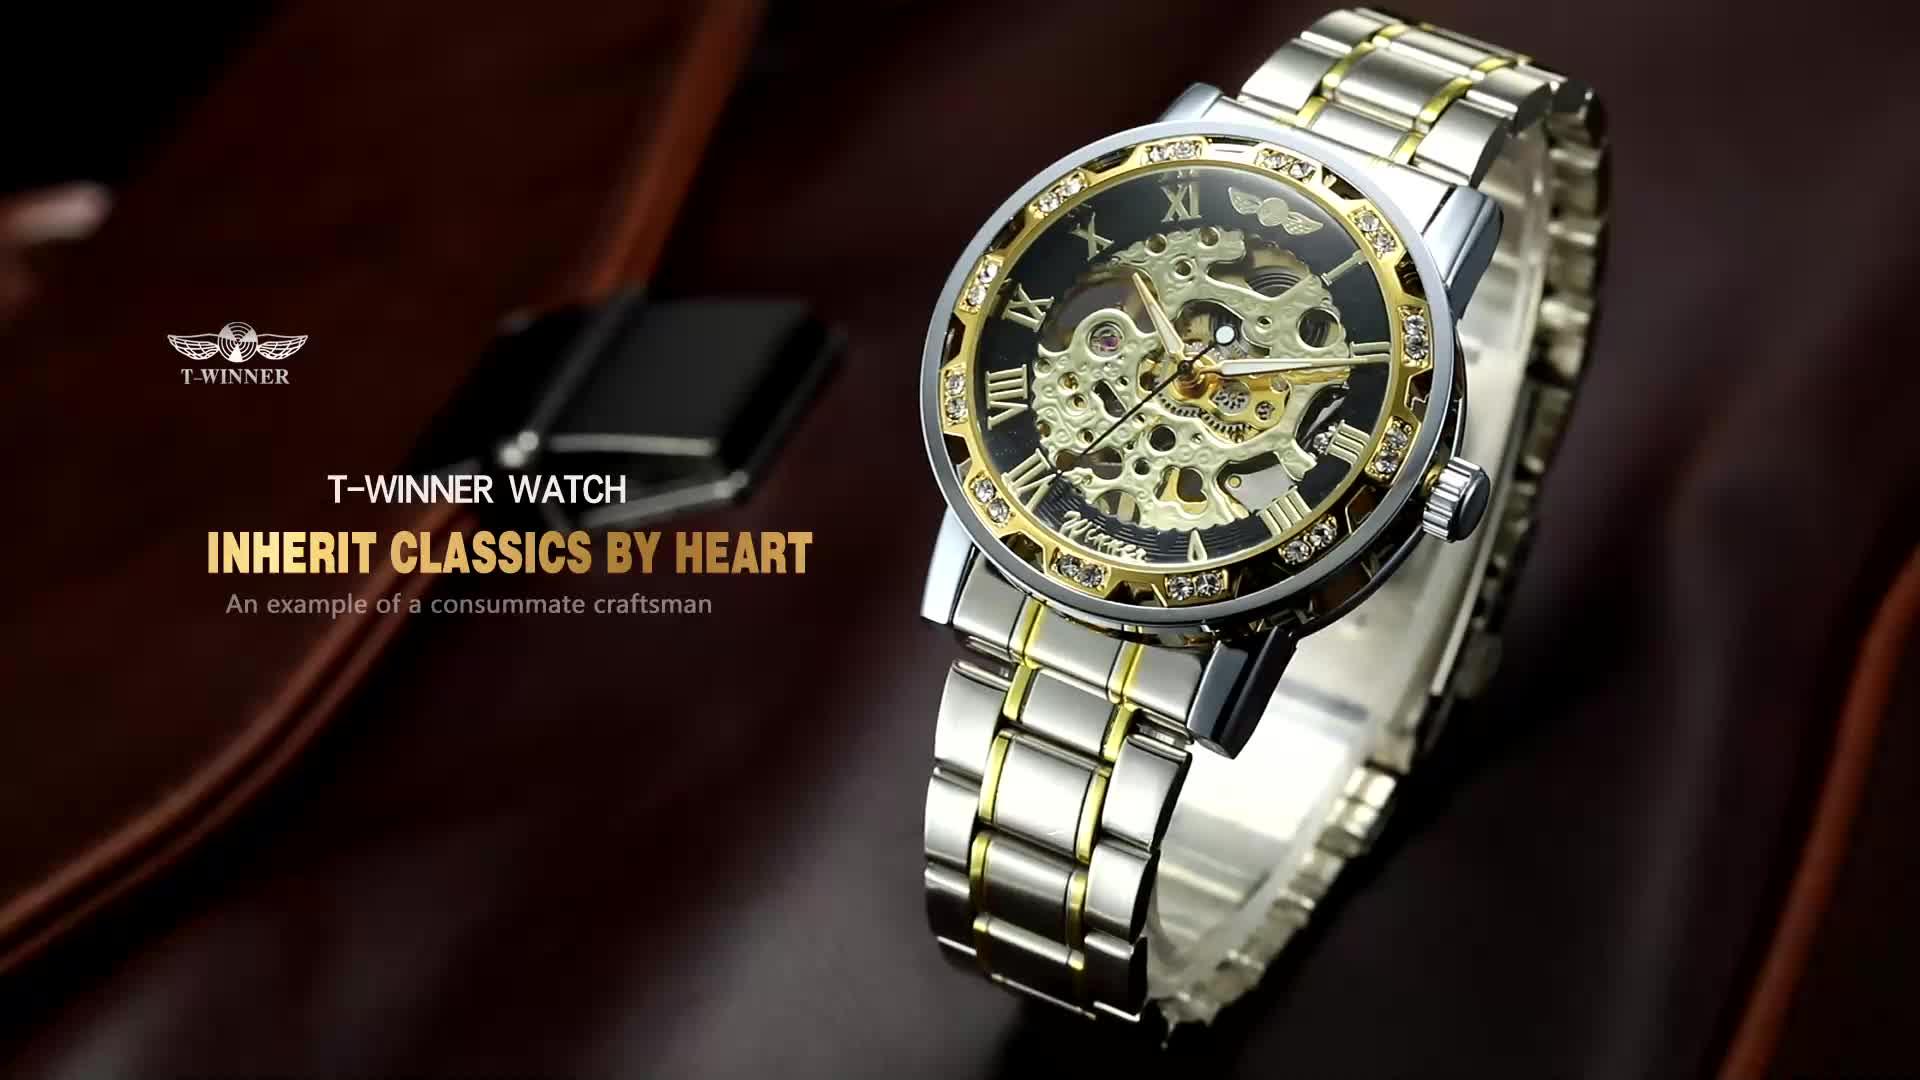 2020 T-זוכה חדש גברים שעונים מכאני מותאם אישית לוגו נירוסטה רצועת יד שעונים